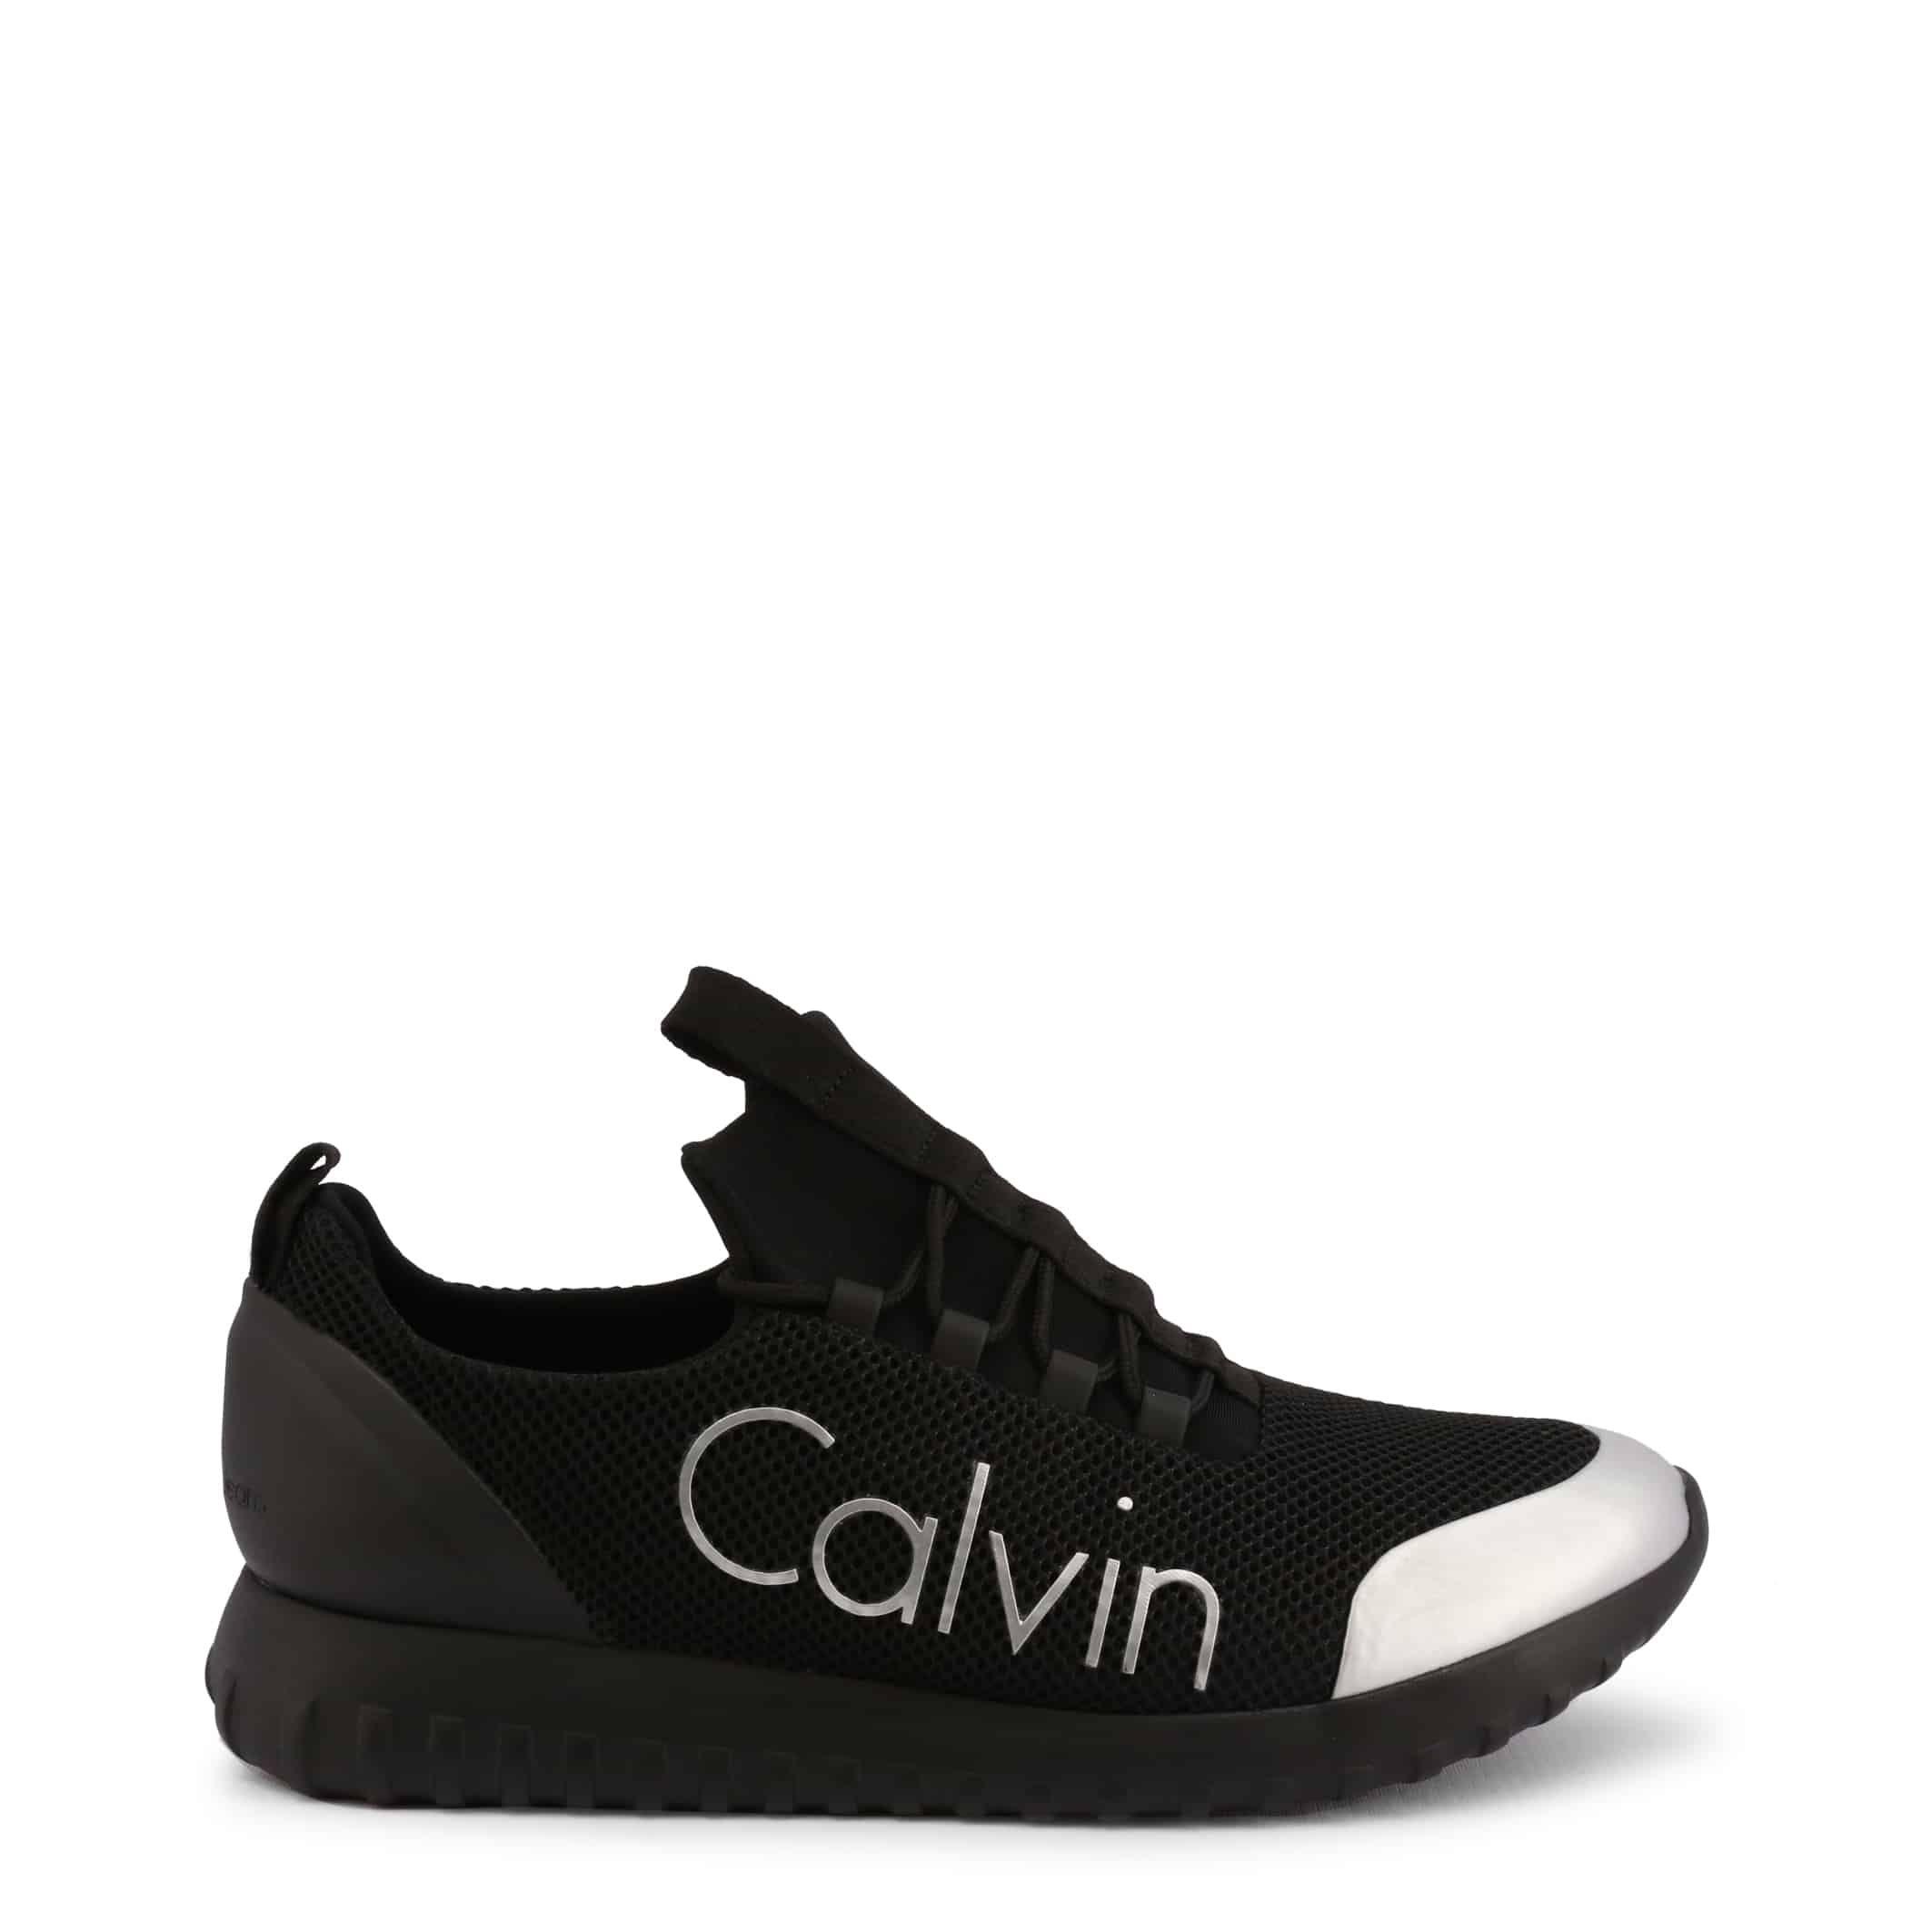 Calvin Klein – RON_B4S0506